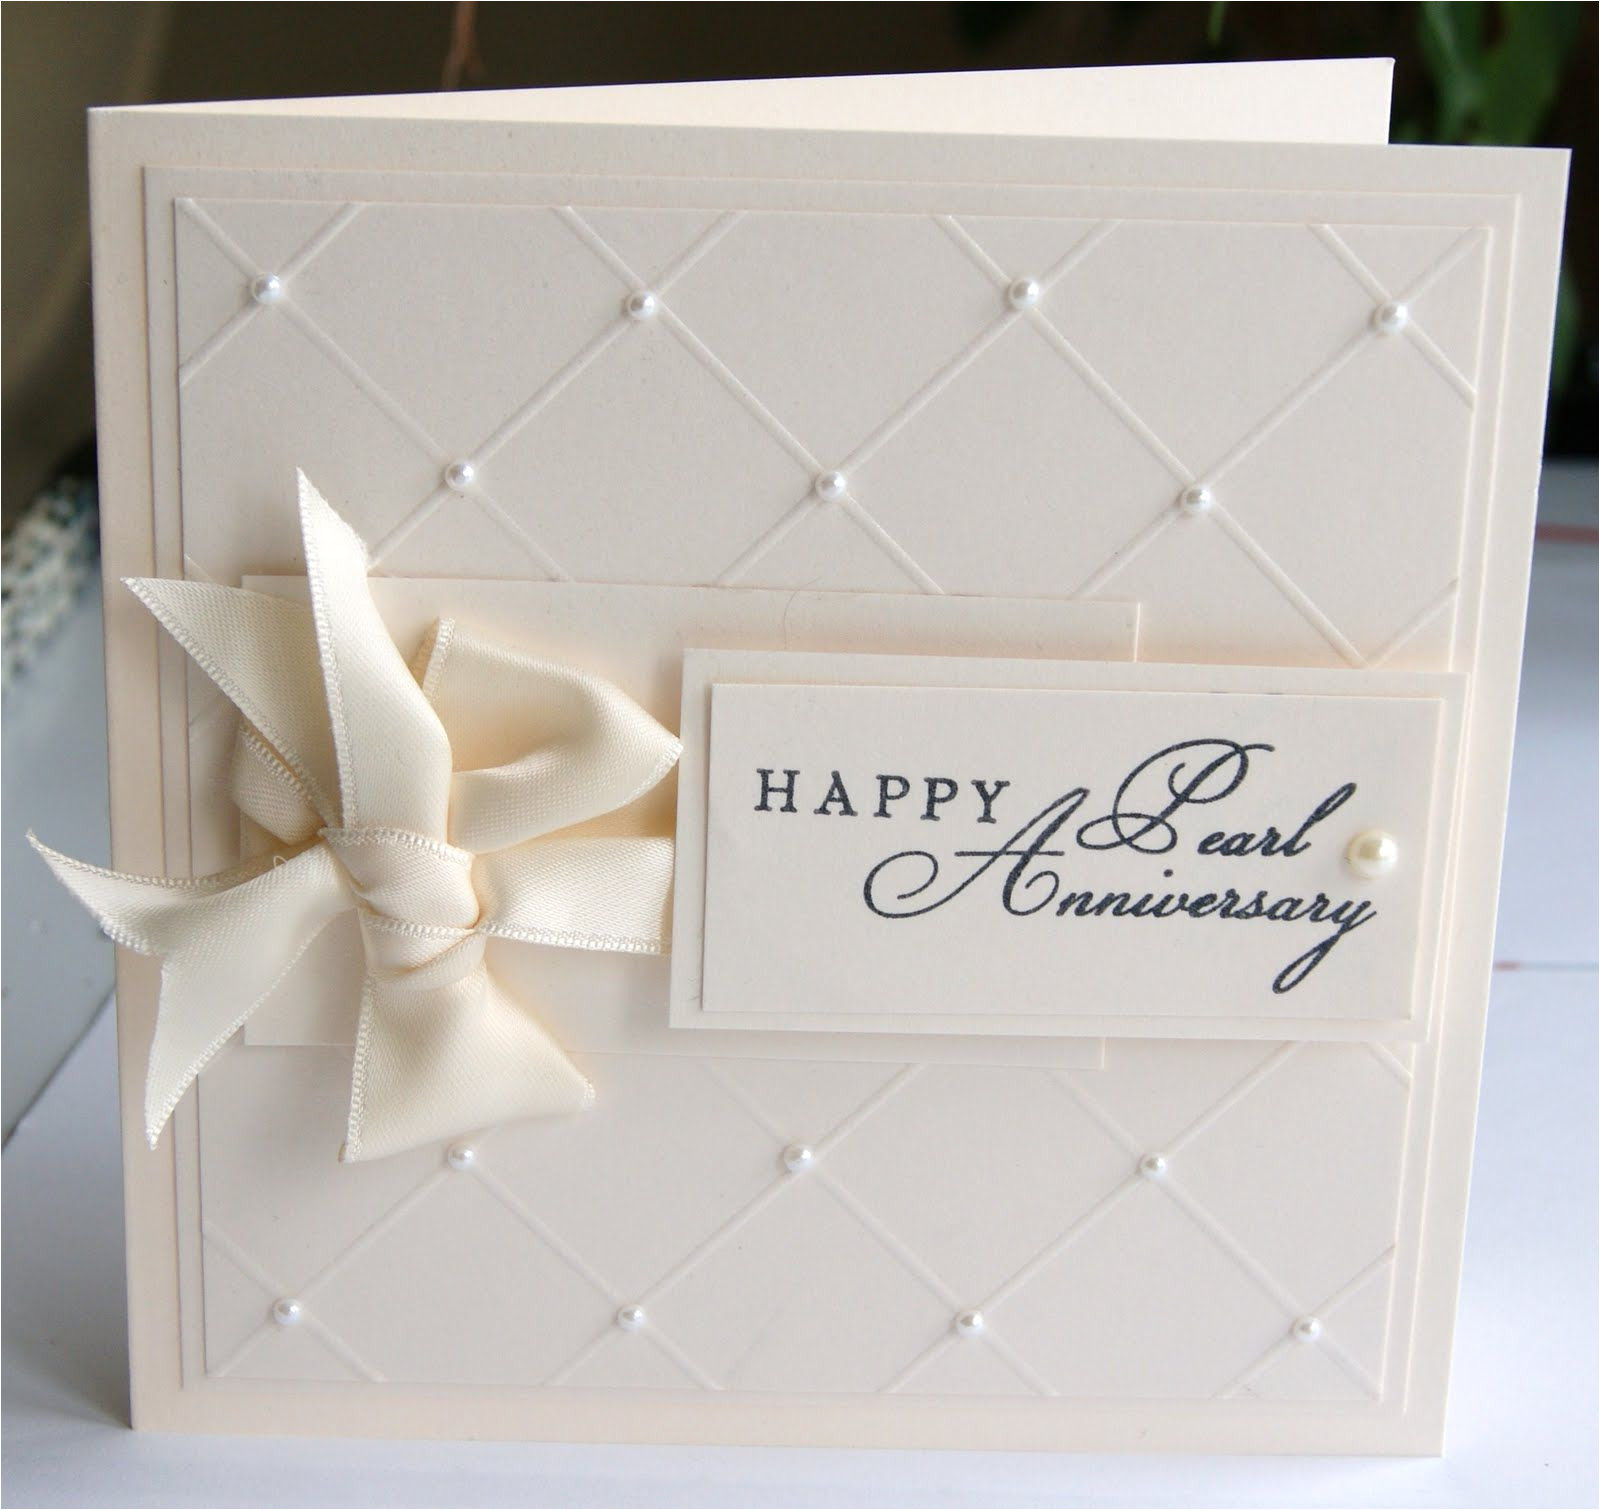 Happy Anniversary Card with Name Pearl Anniversary Card Con Imagenes Invitaciones Para